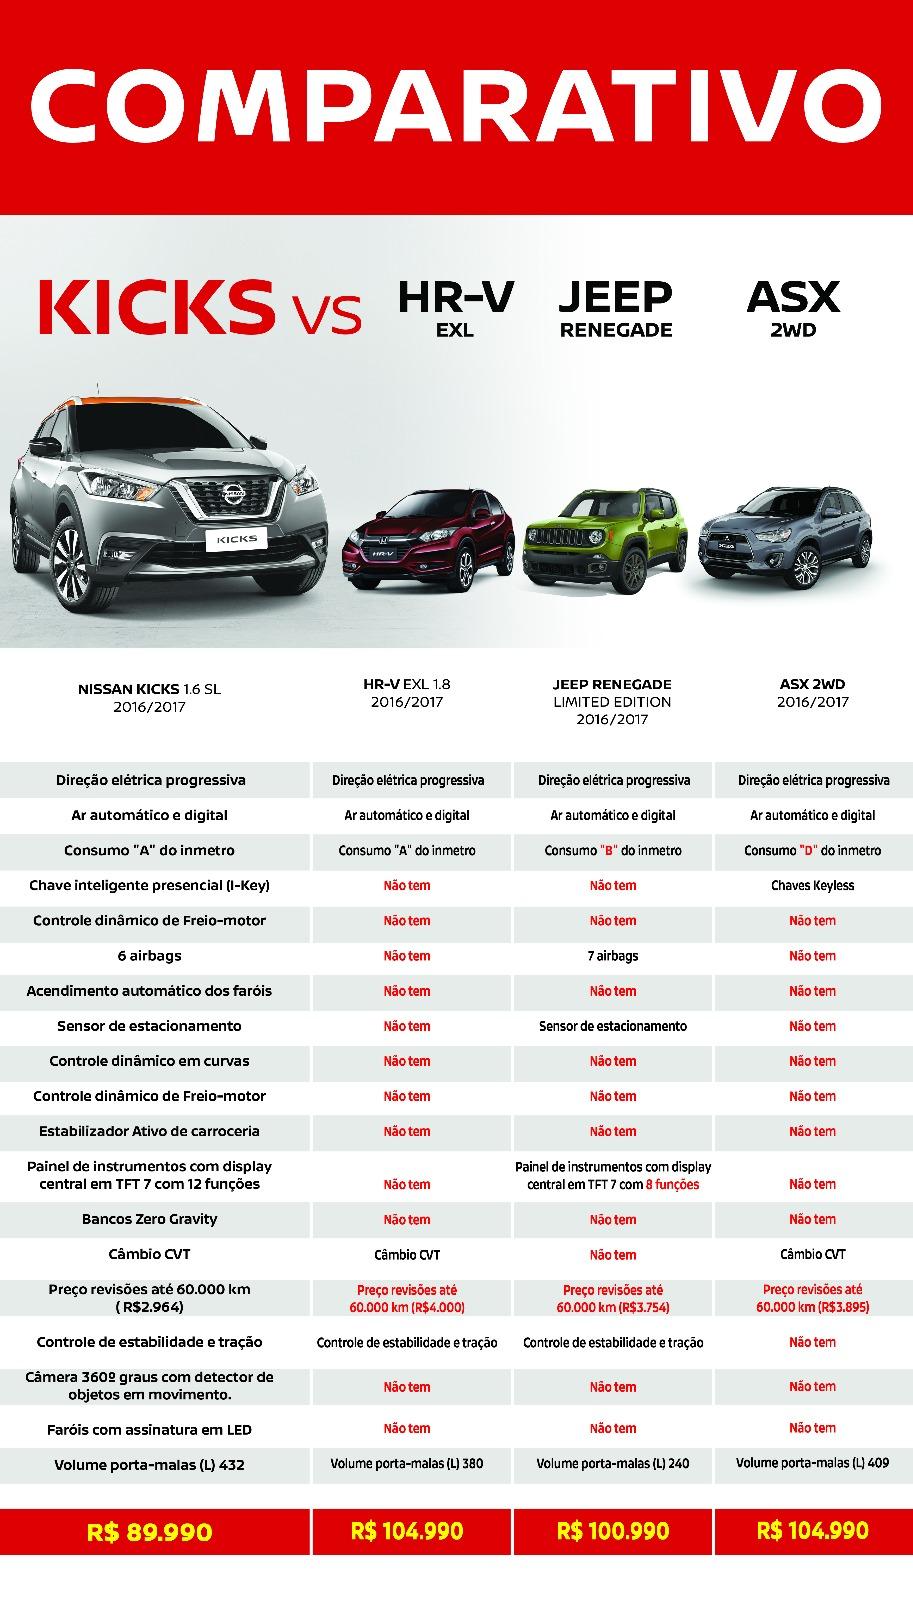 Compare e comprove: Nissan Kicks SL enfrenta Honda HR-V, Jeep Renegade e Mitsubishi ASX